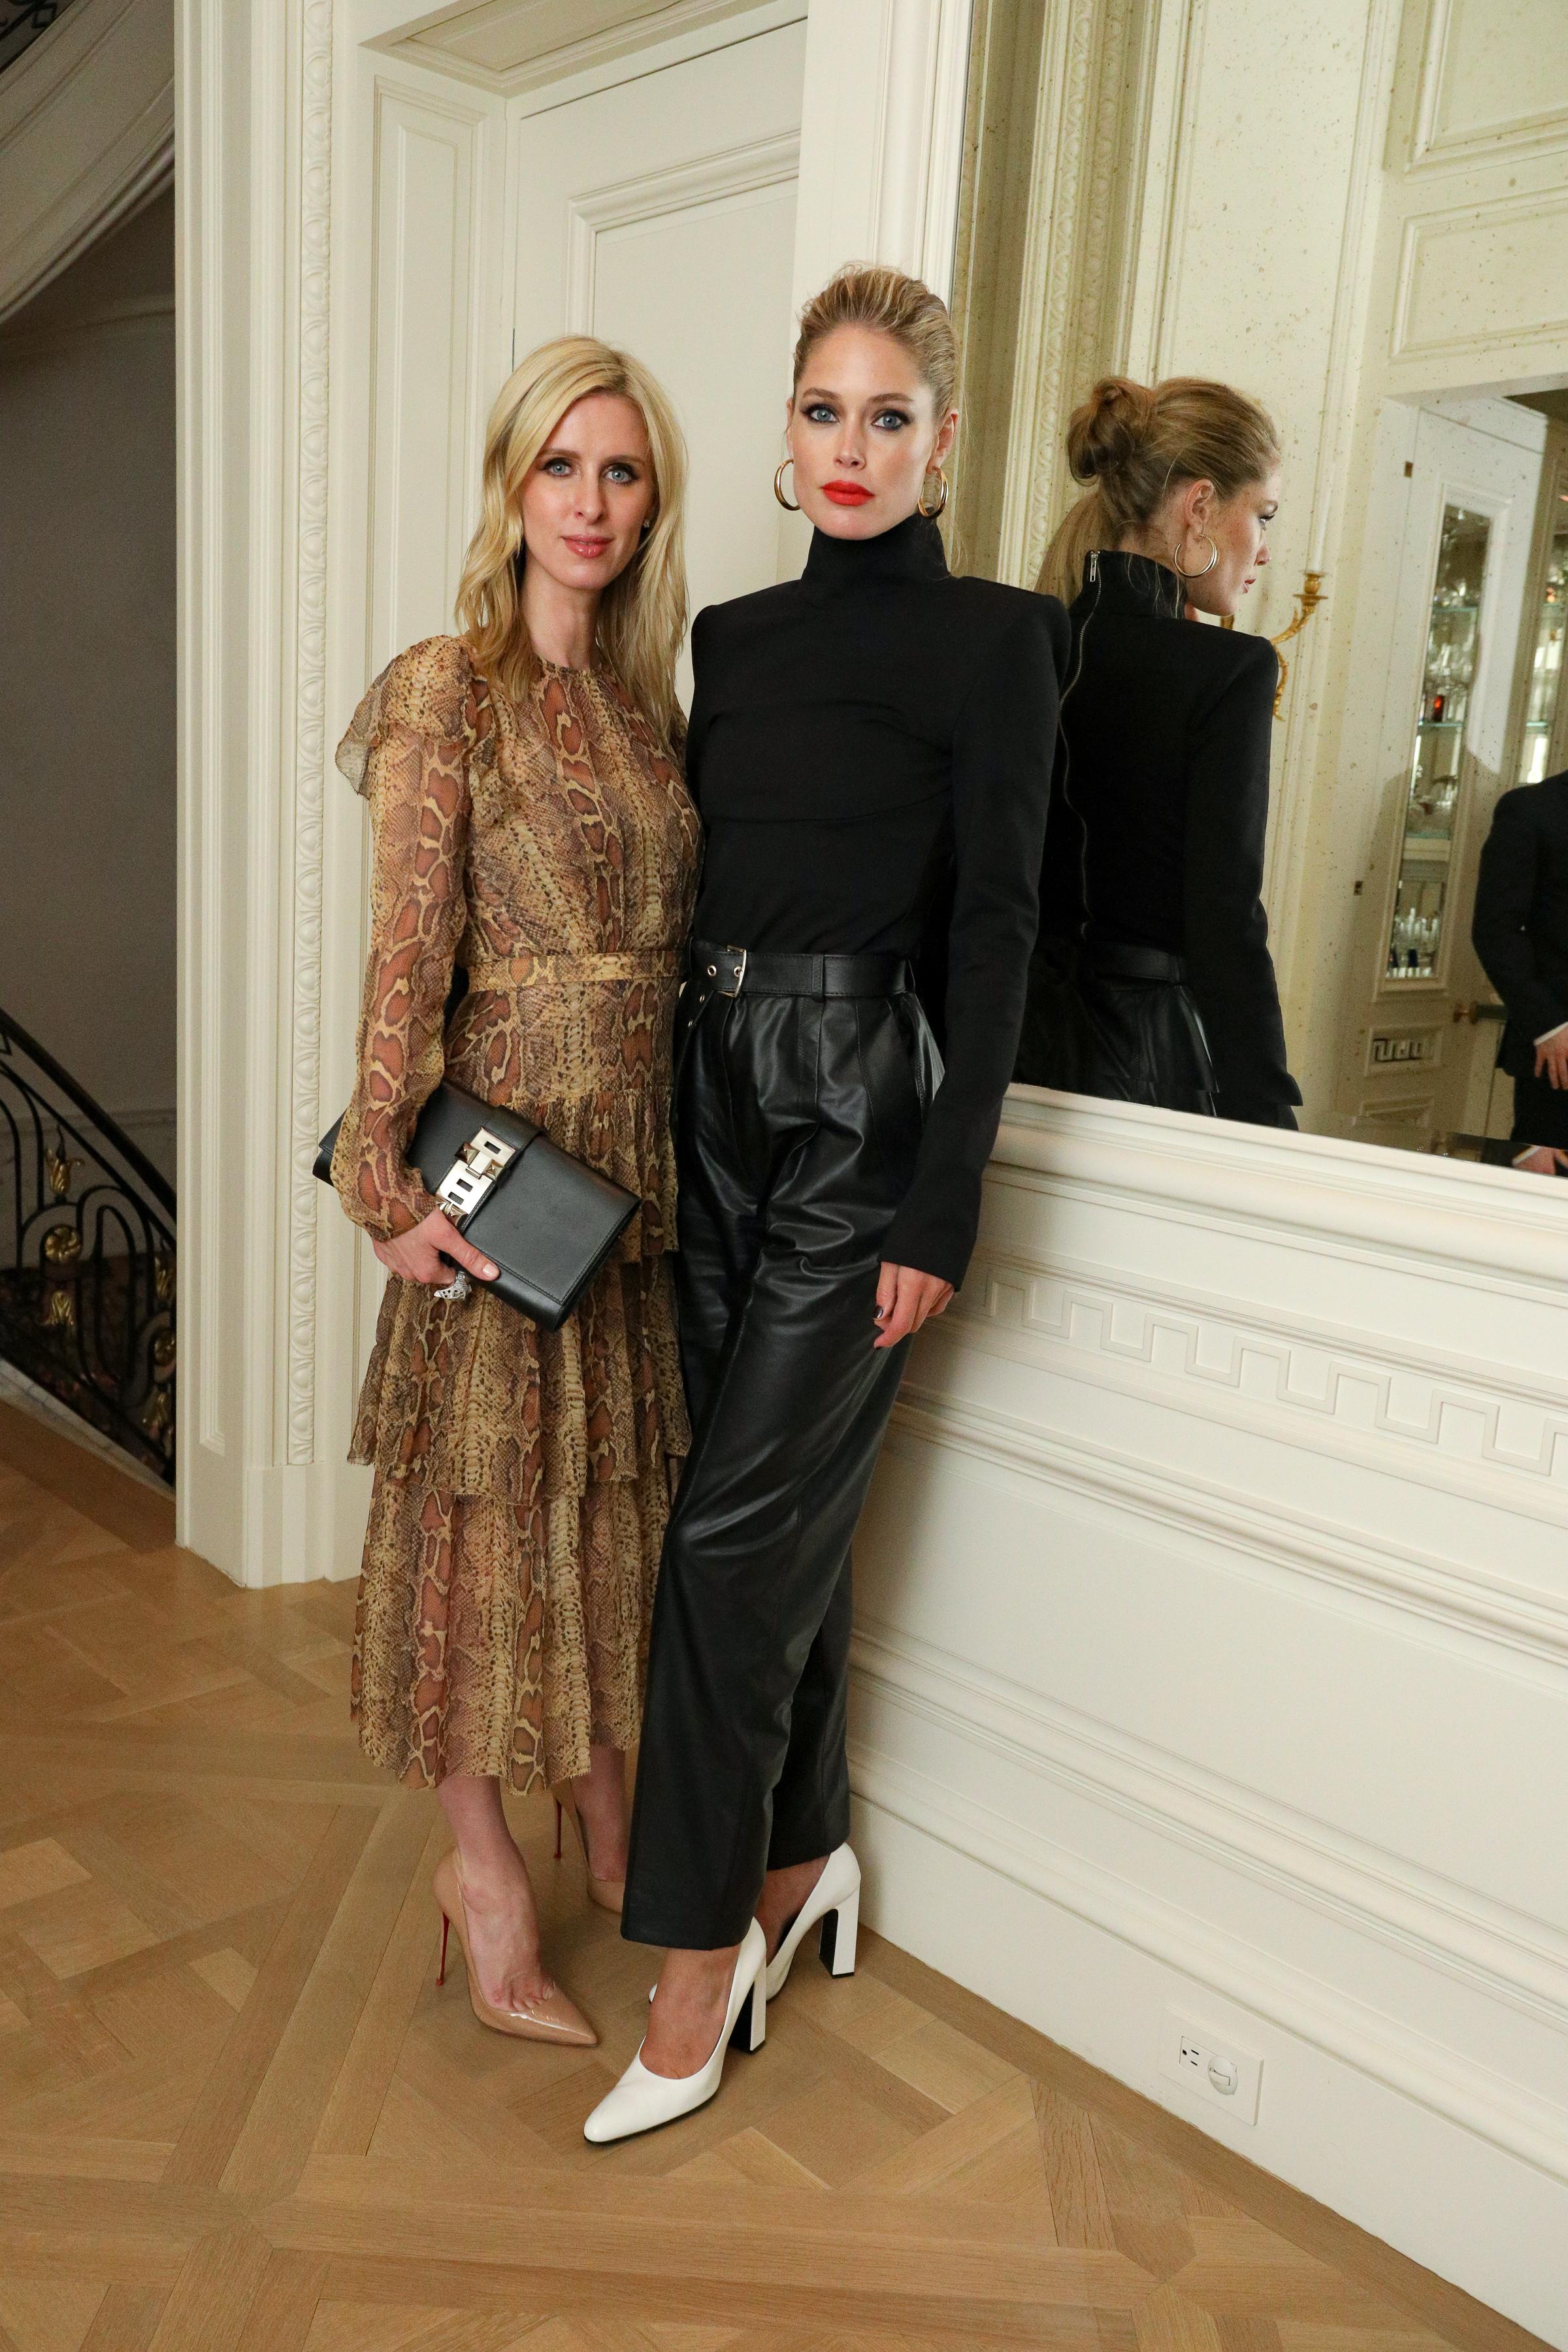 Socialite Nicky Hilton Rothschild and model Doutzen Kroes.